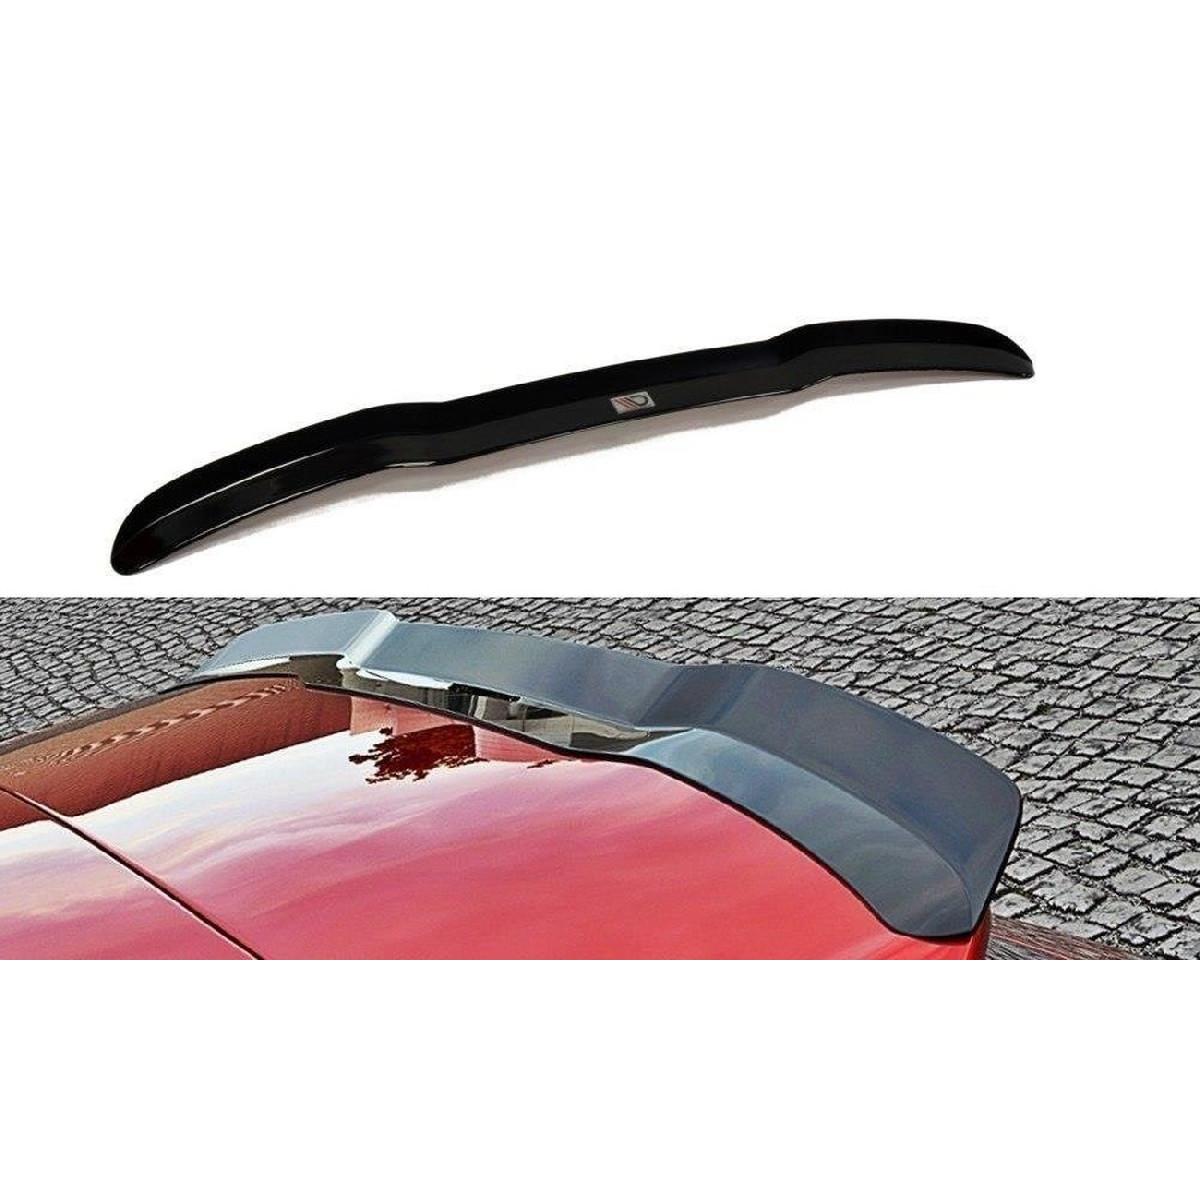 Heck Spoiler Aufsatz Abrisskante für Audi S3 / A3 S-Line 8V / 8V FL Hatchback / Sportback schwarz matt